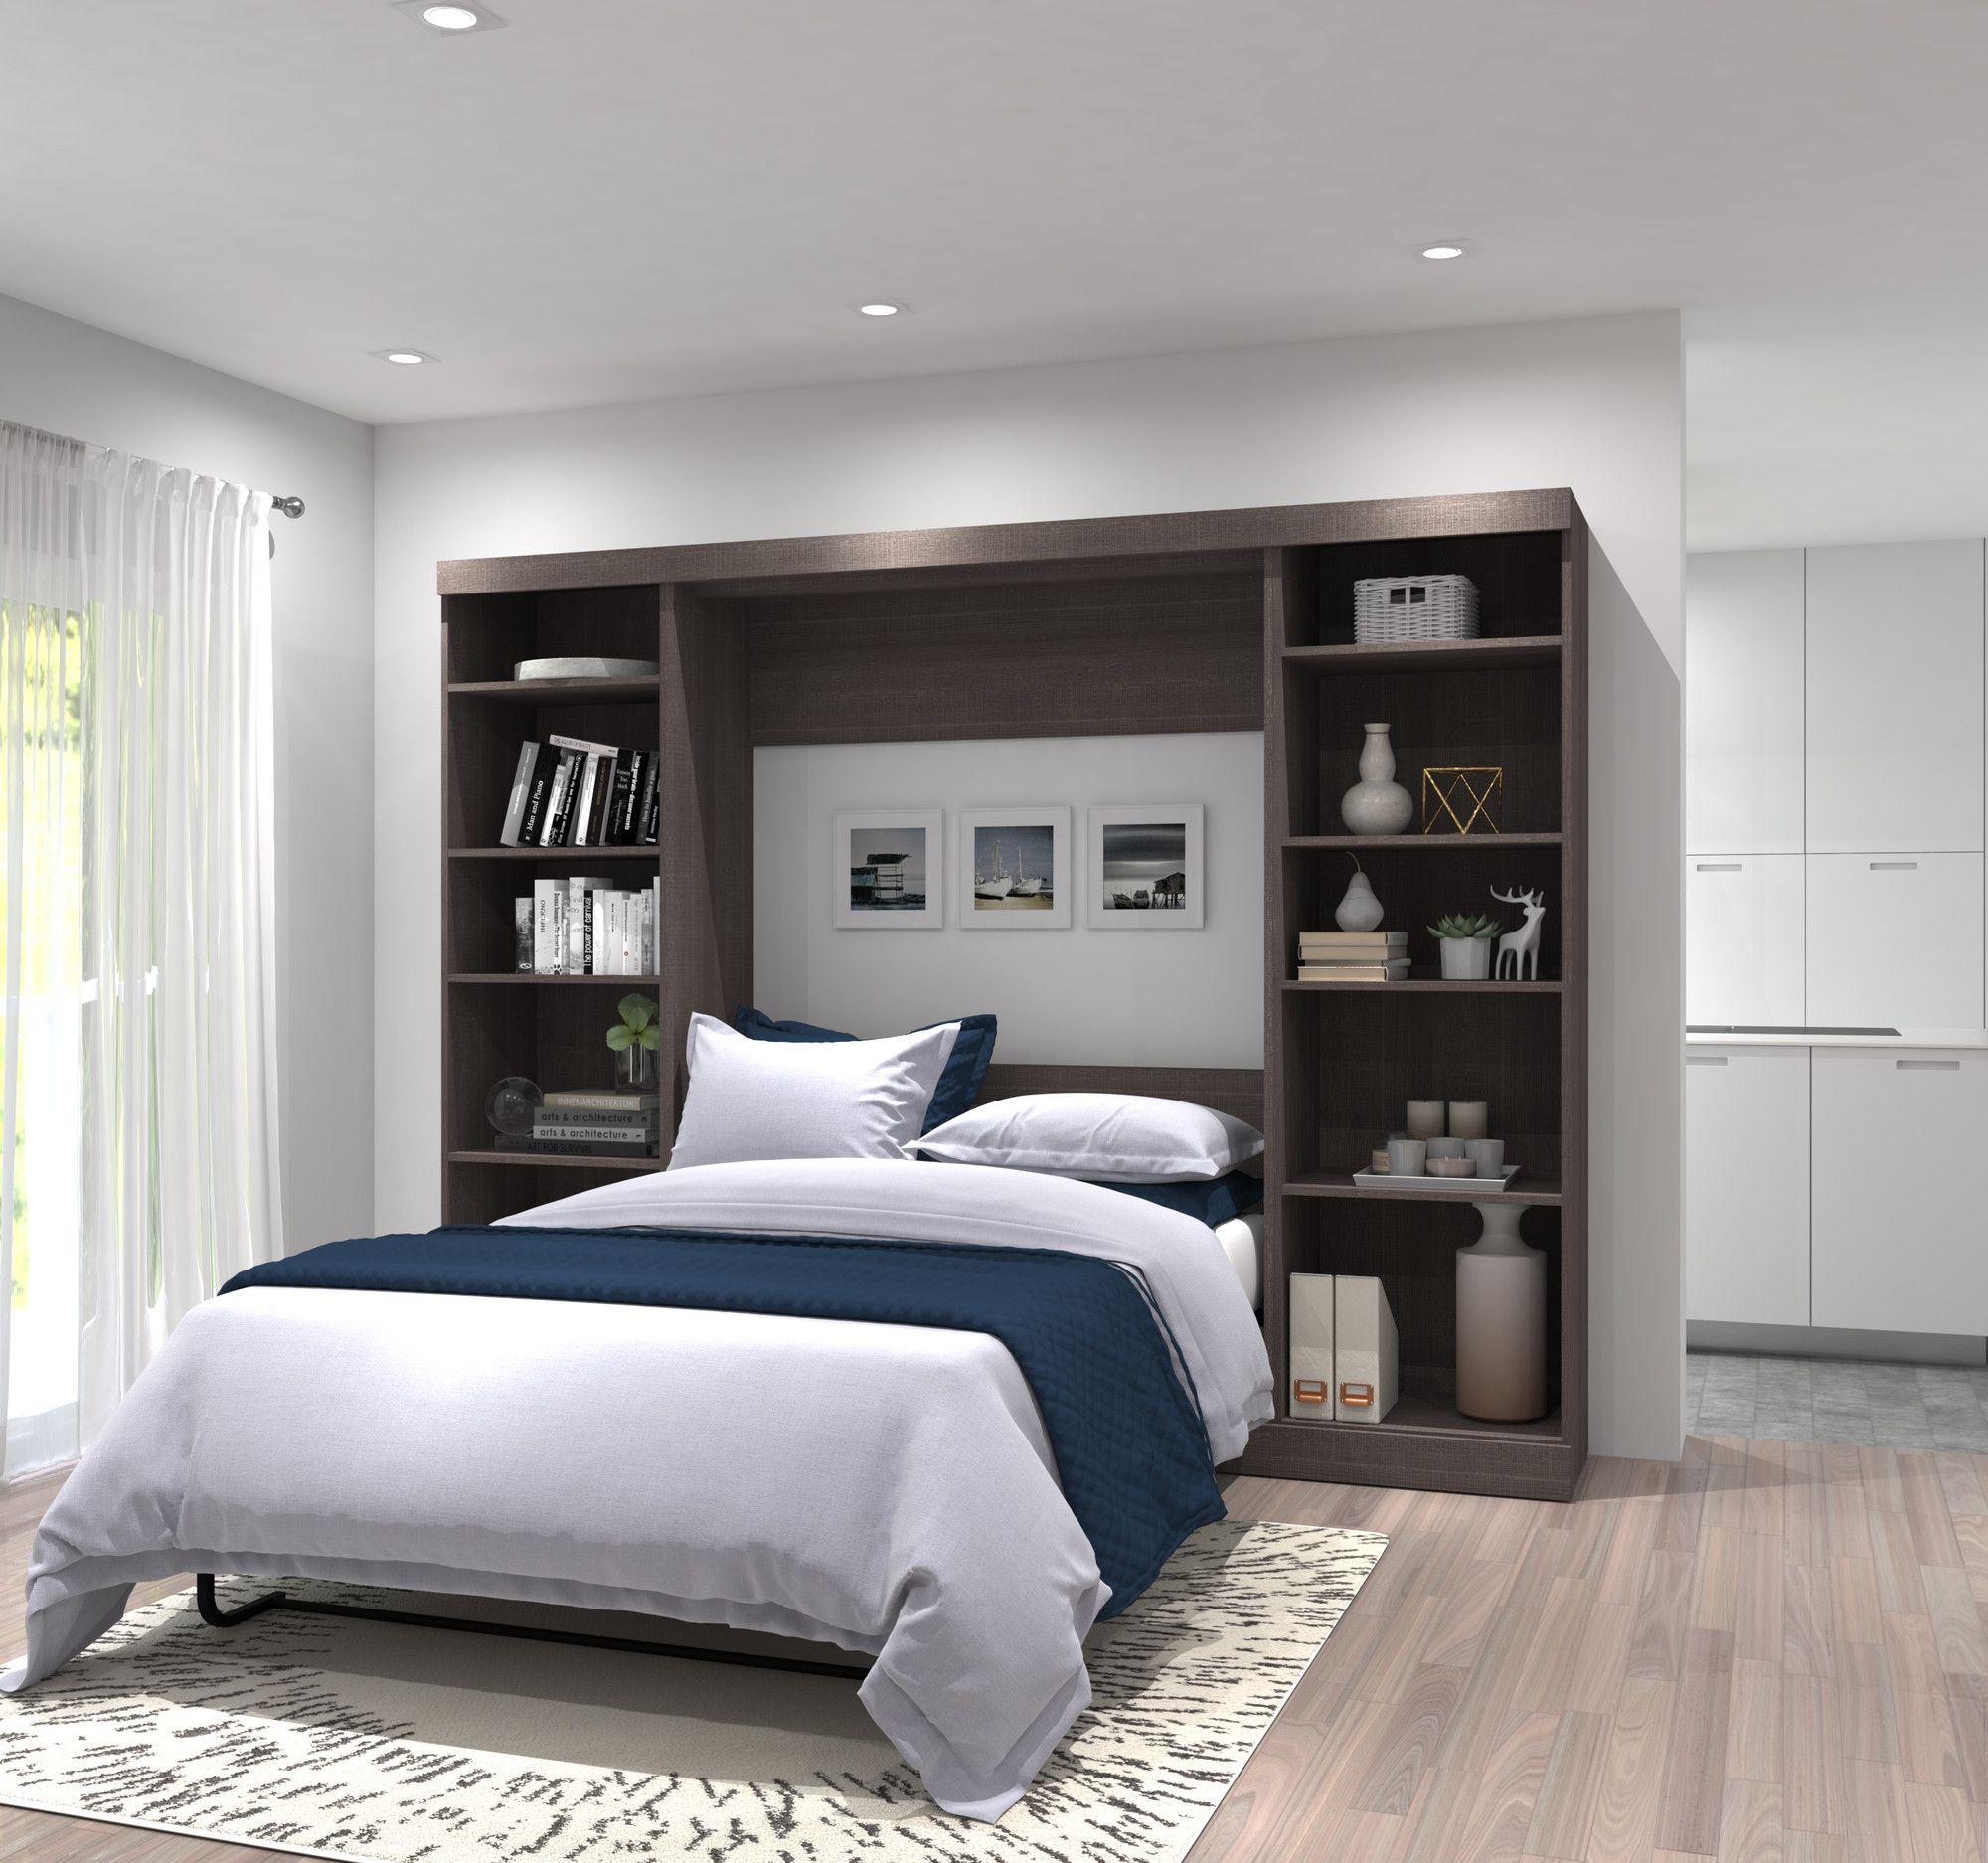 Walley Full Double Murphy Bed Remodel Bedroom Guest Bedroom Remodel Wall Bed